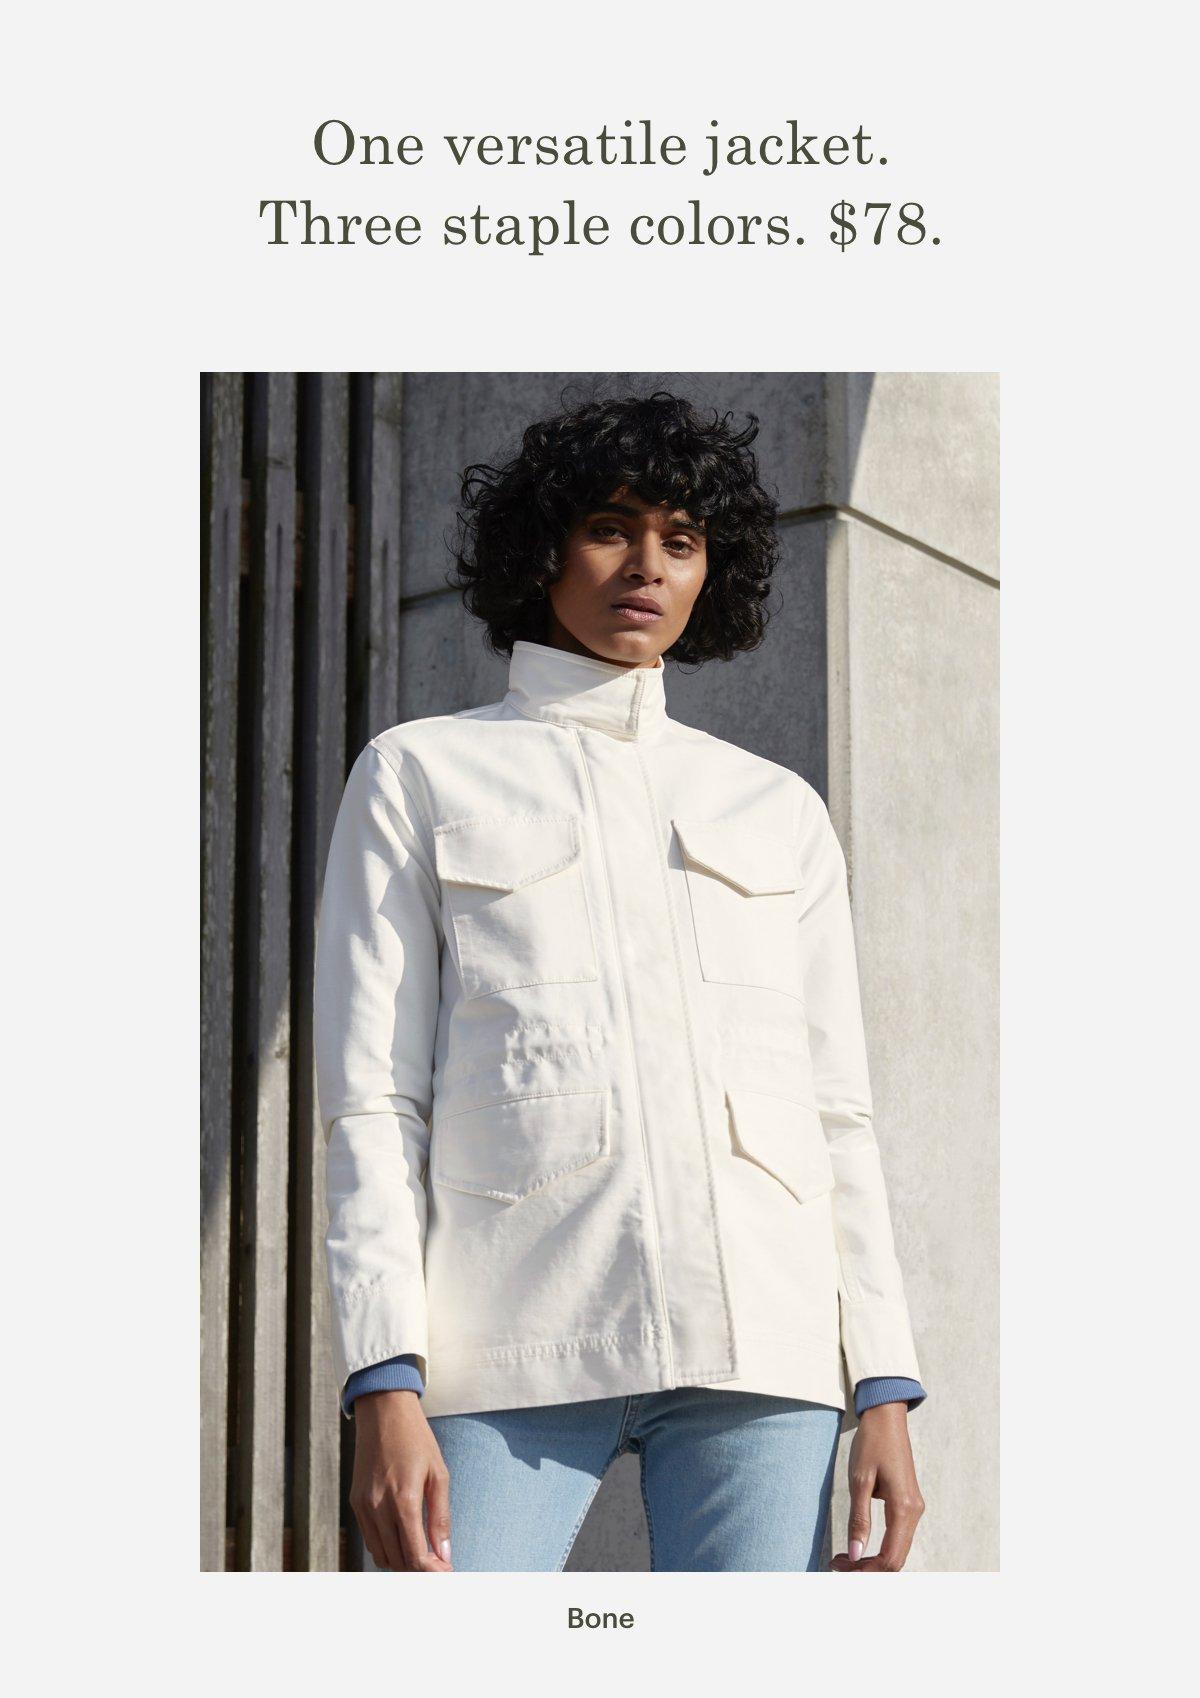 One versatile jacket. Three staple colors. $78. Bone.